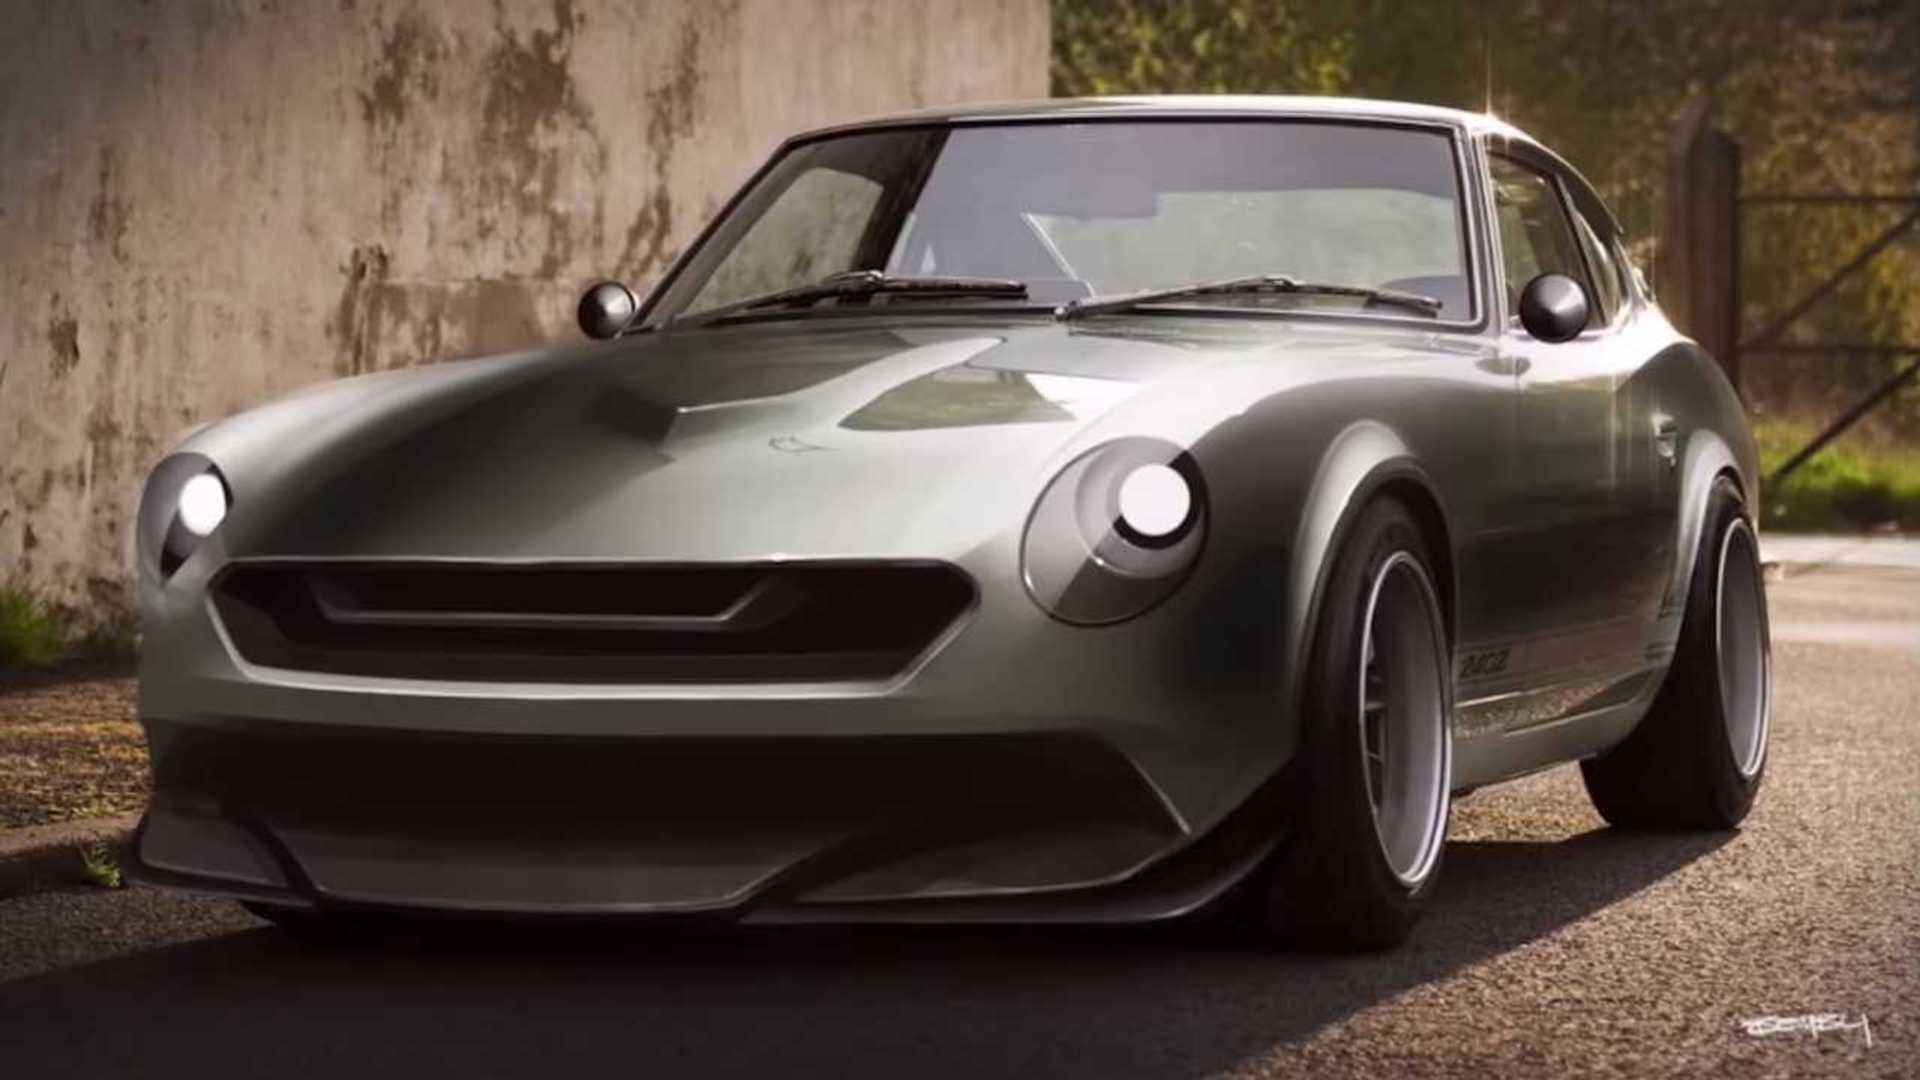 For The Love Of The Z: Watch Datsun 240Z Get Modernized Design